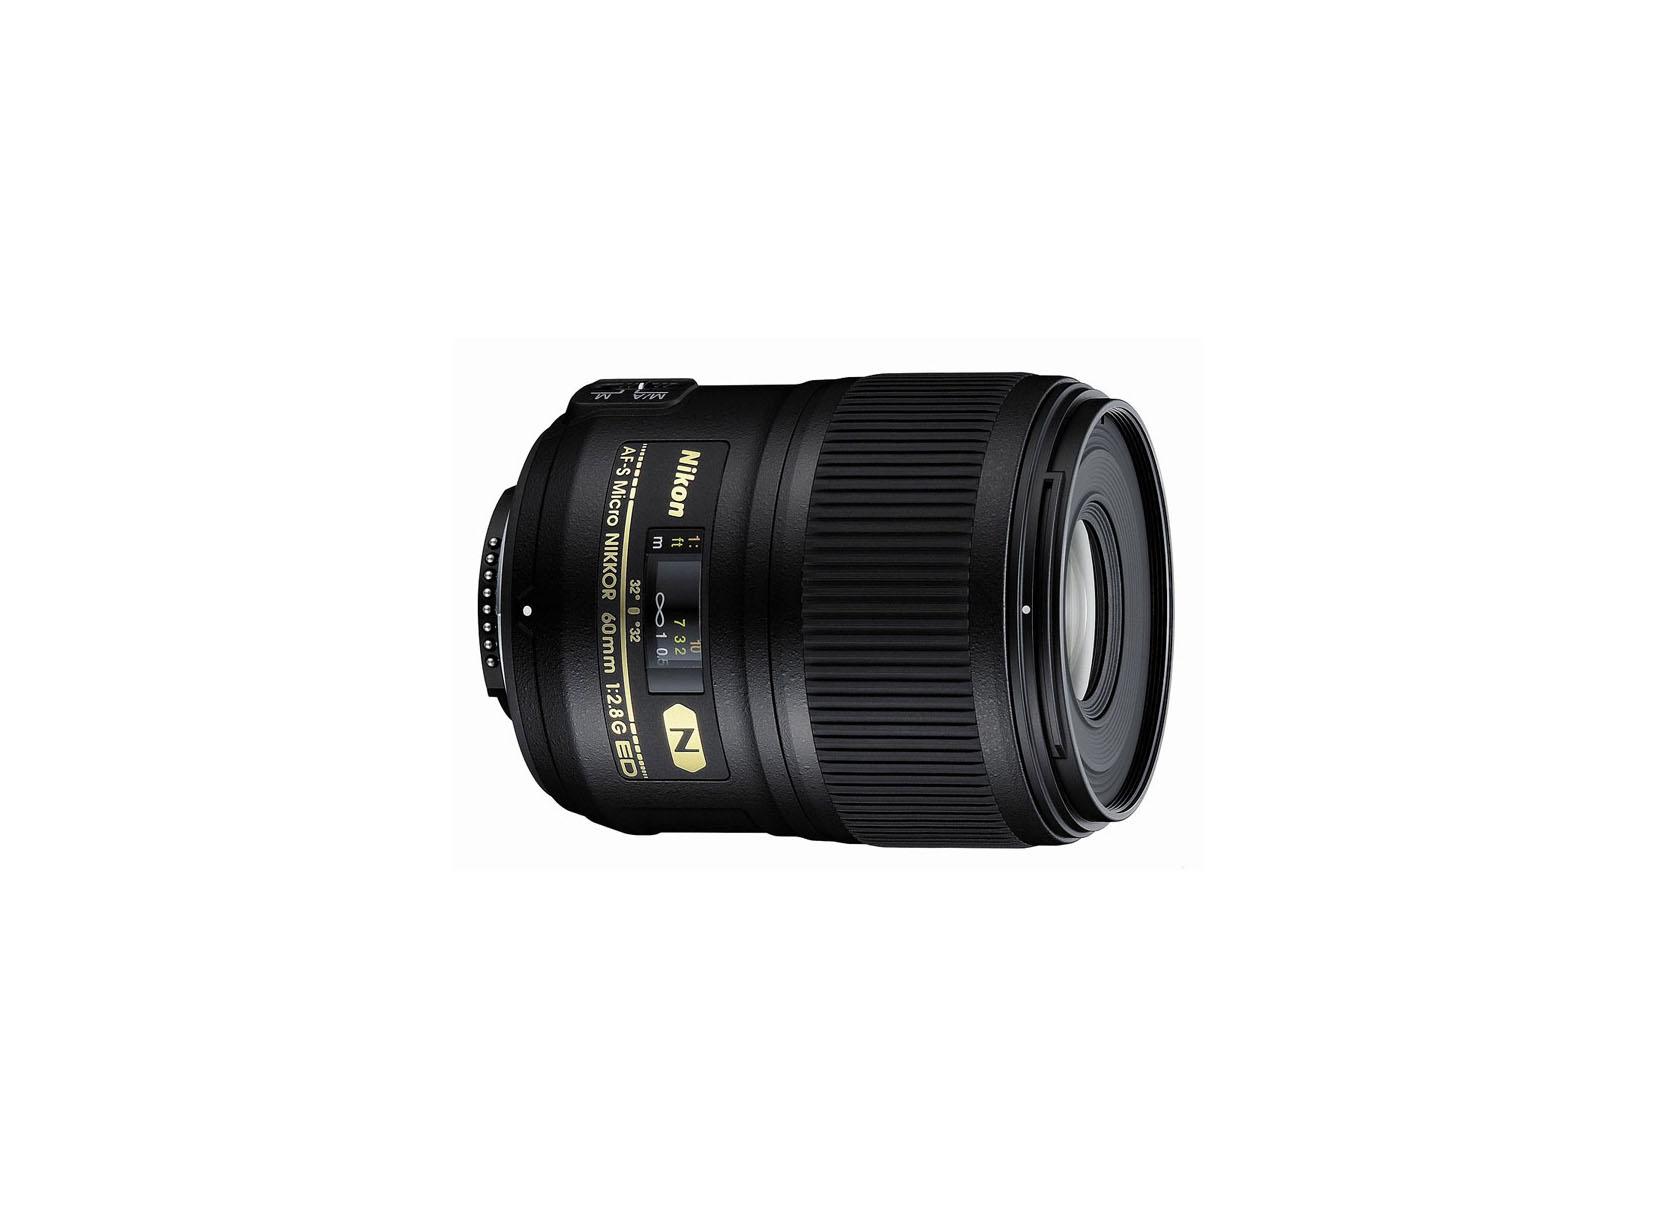 لنز Nikon AF-S 60mm f/2.8 G ED Micro